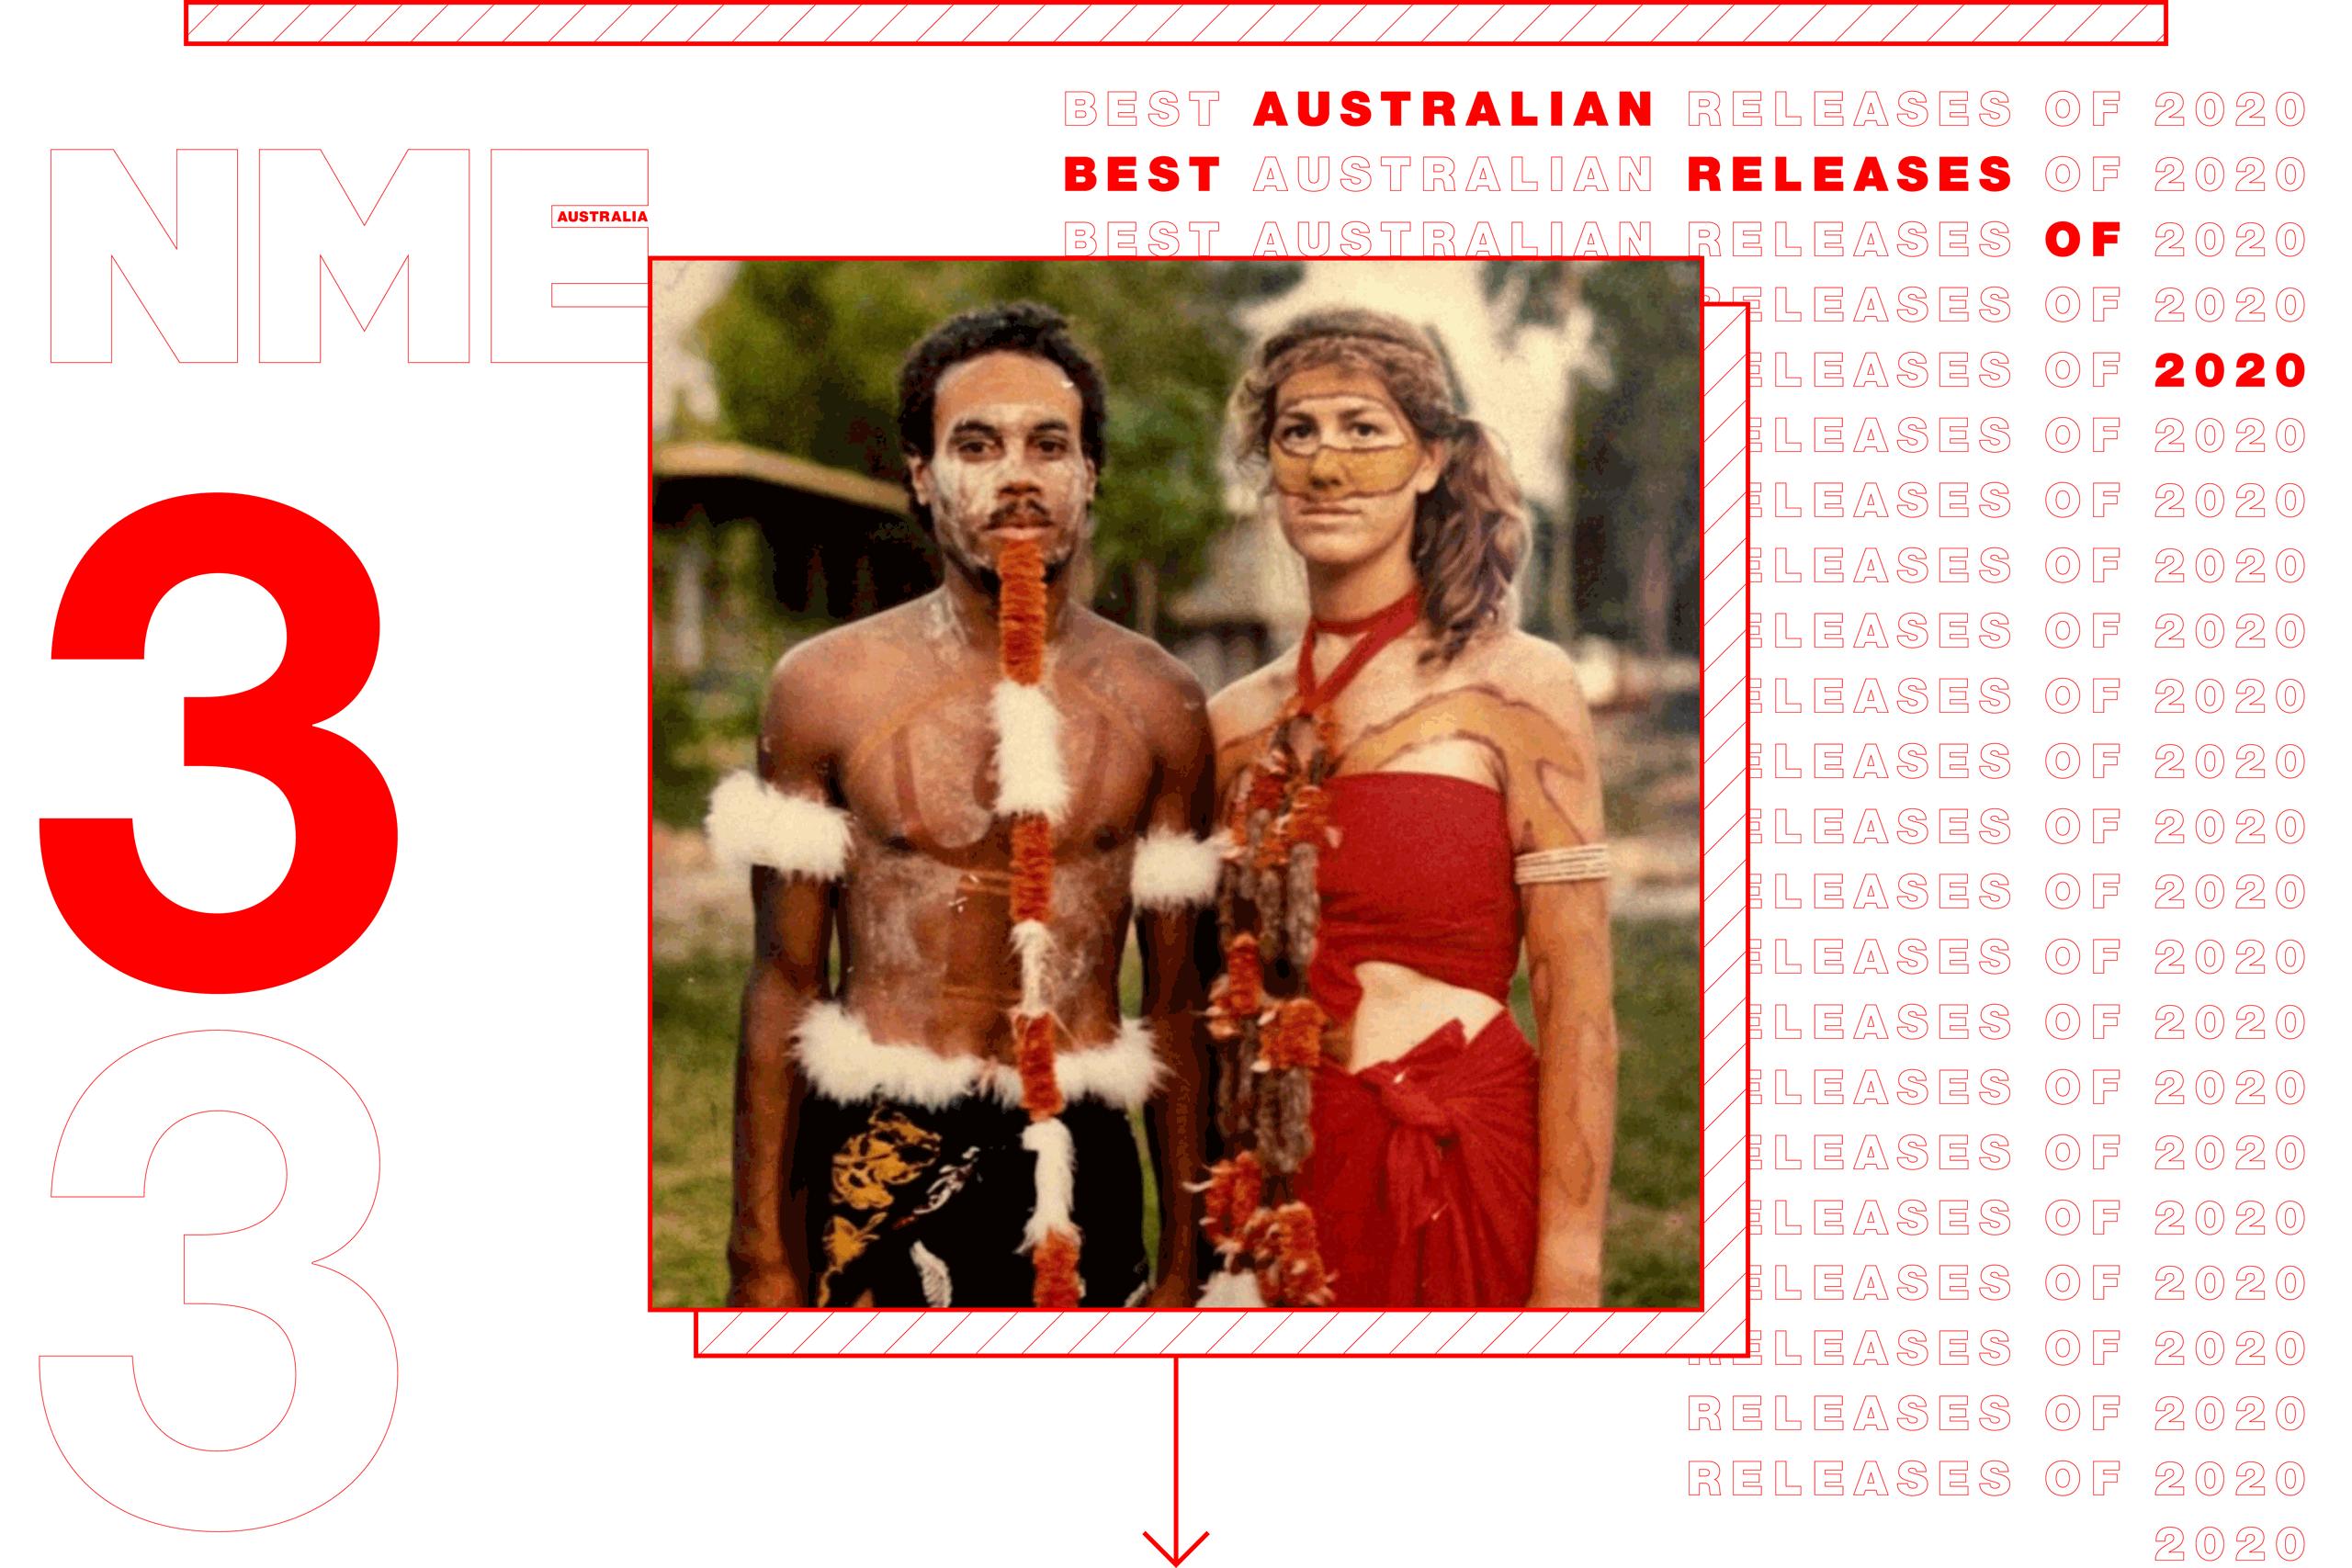 NME Australian Album Release 3